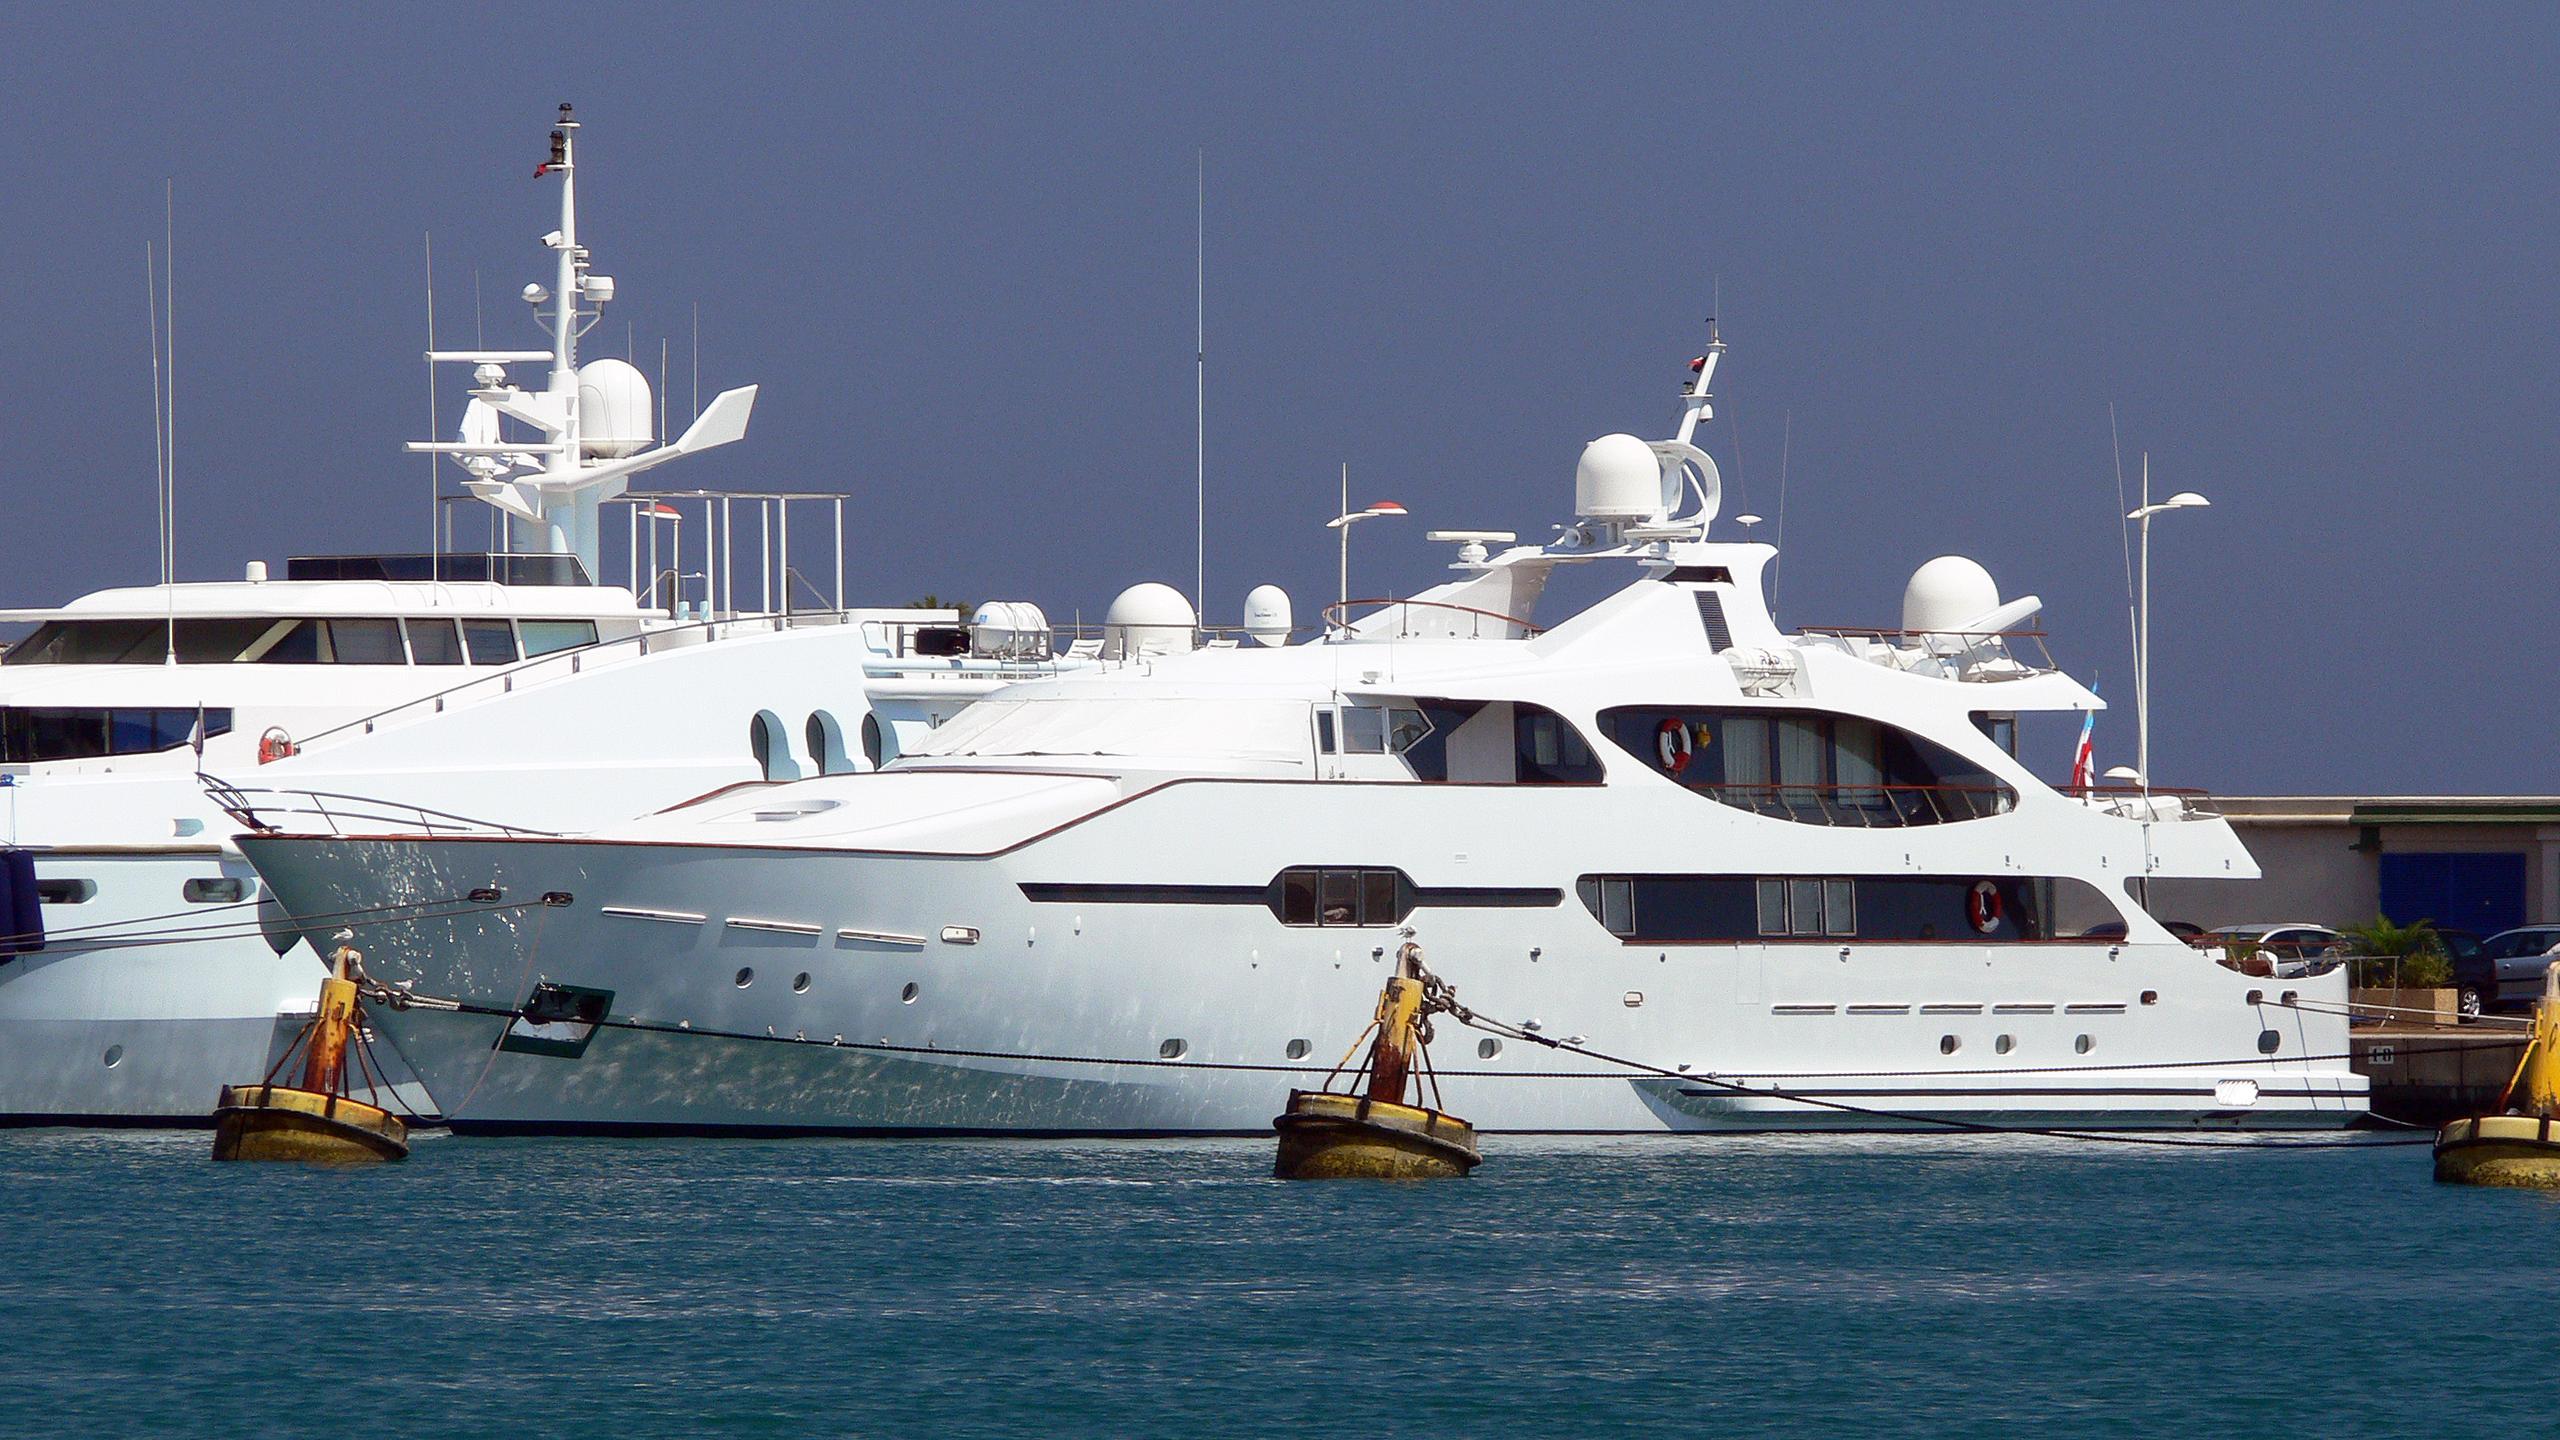 jameel-motor-yacht-crn-1985-50m-half-profile